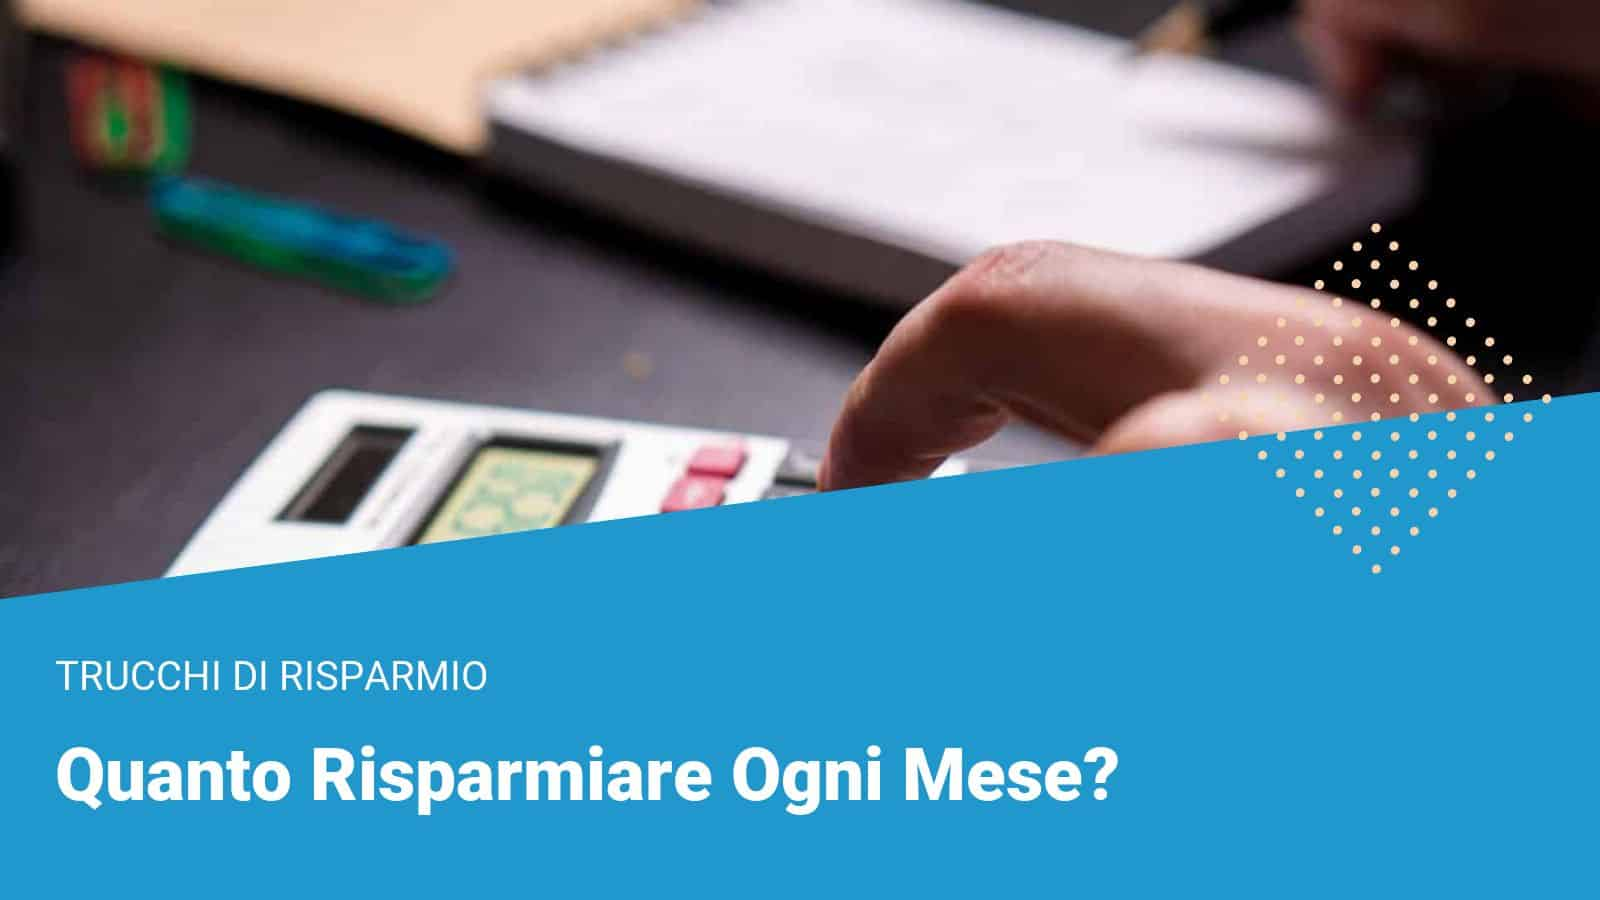 Quanto risparmiare ogni mese - Financer.com Italia